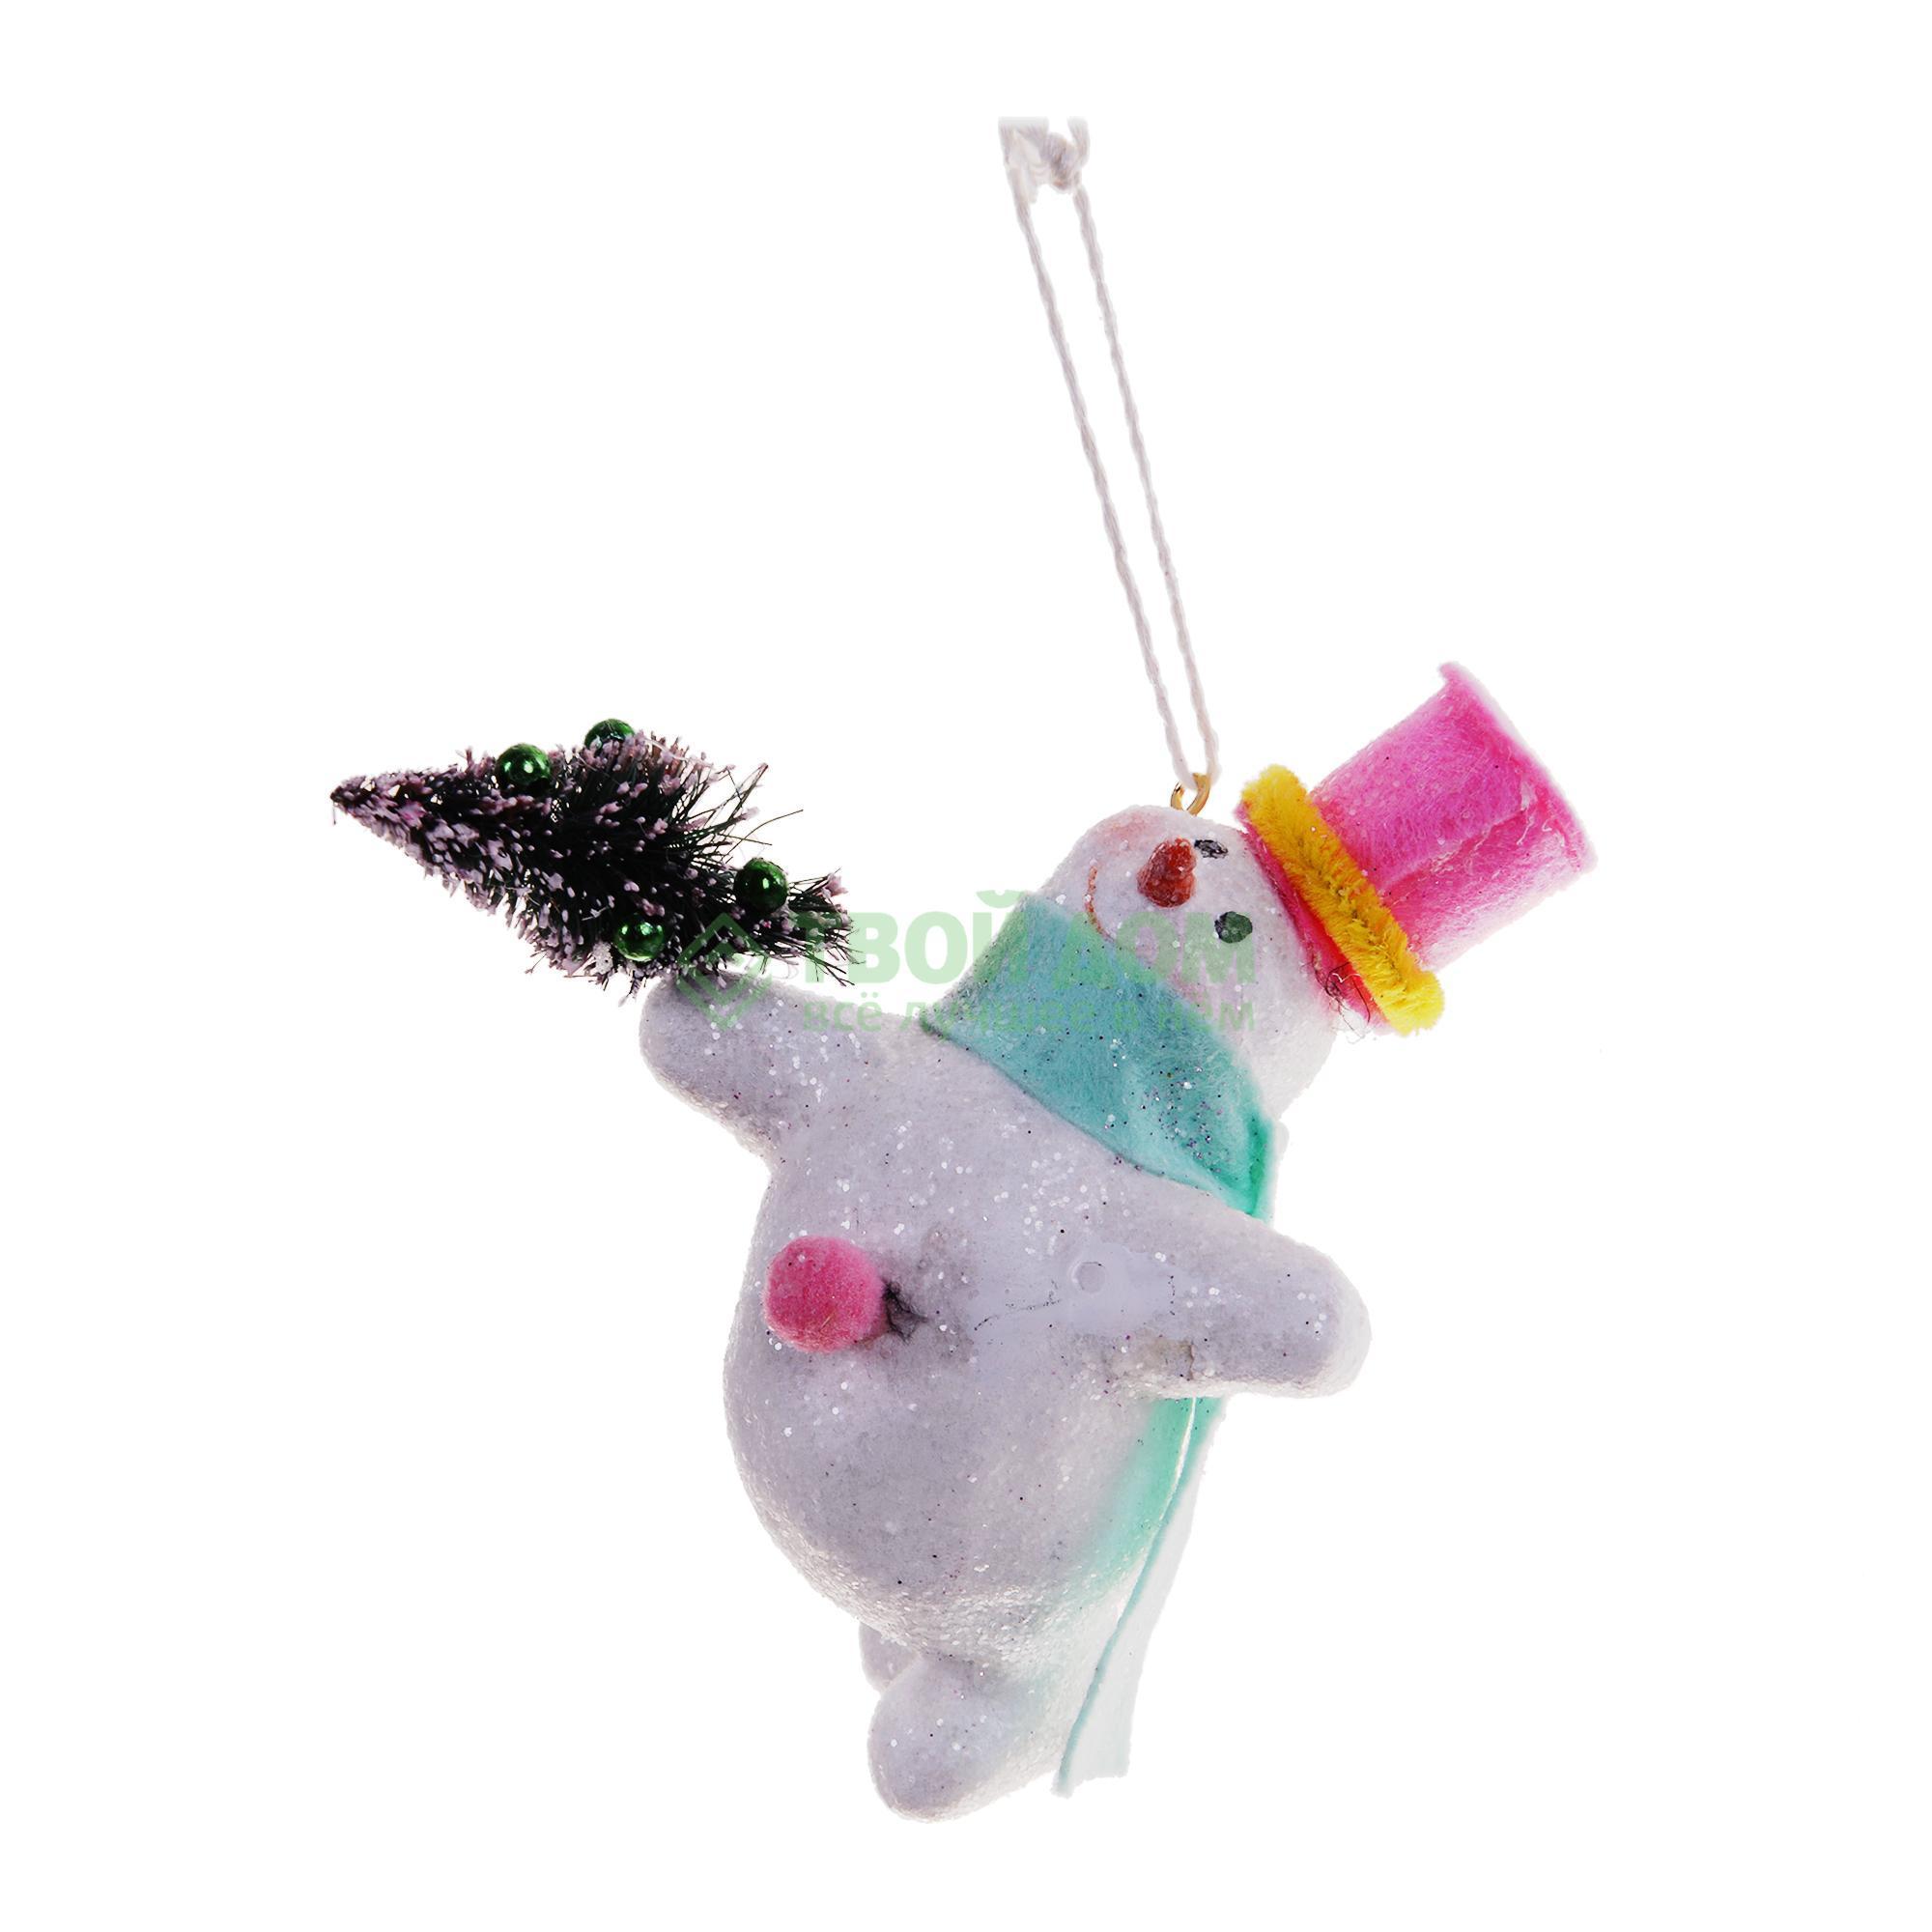 Фигурка Goodwill Снеговик 12.5см (Y 28219) фигурка lefard снеговик 787 179